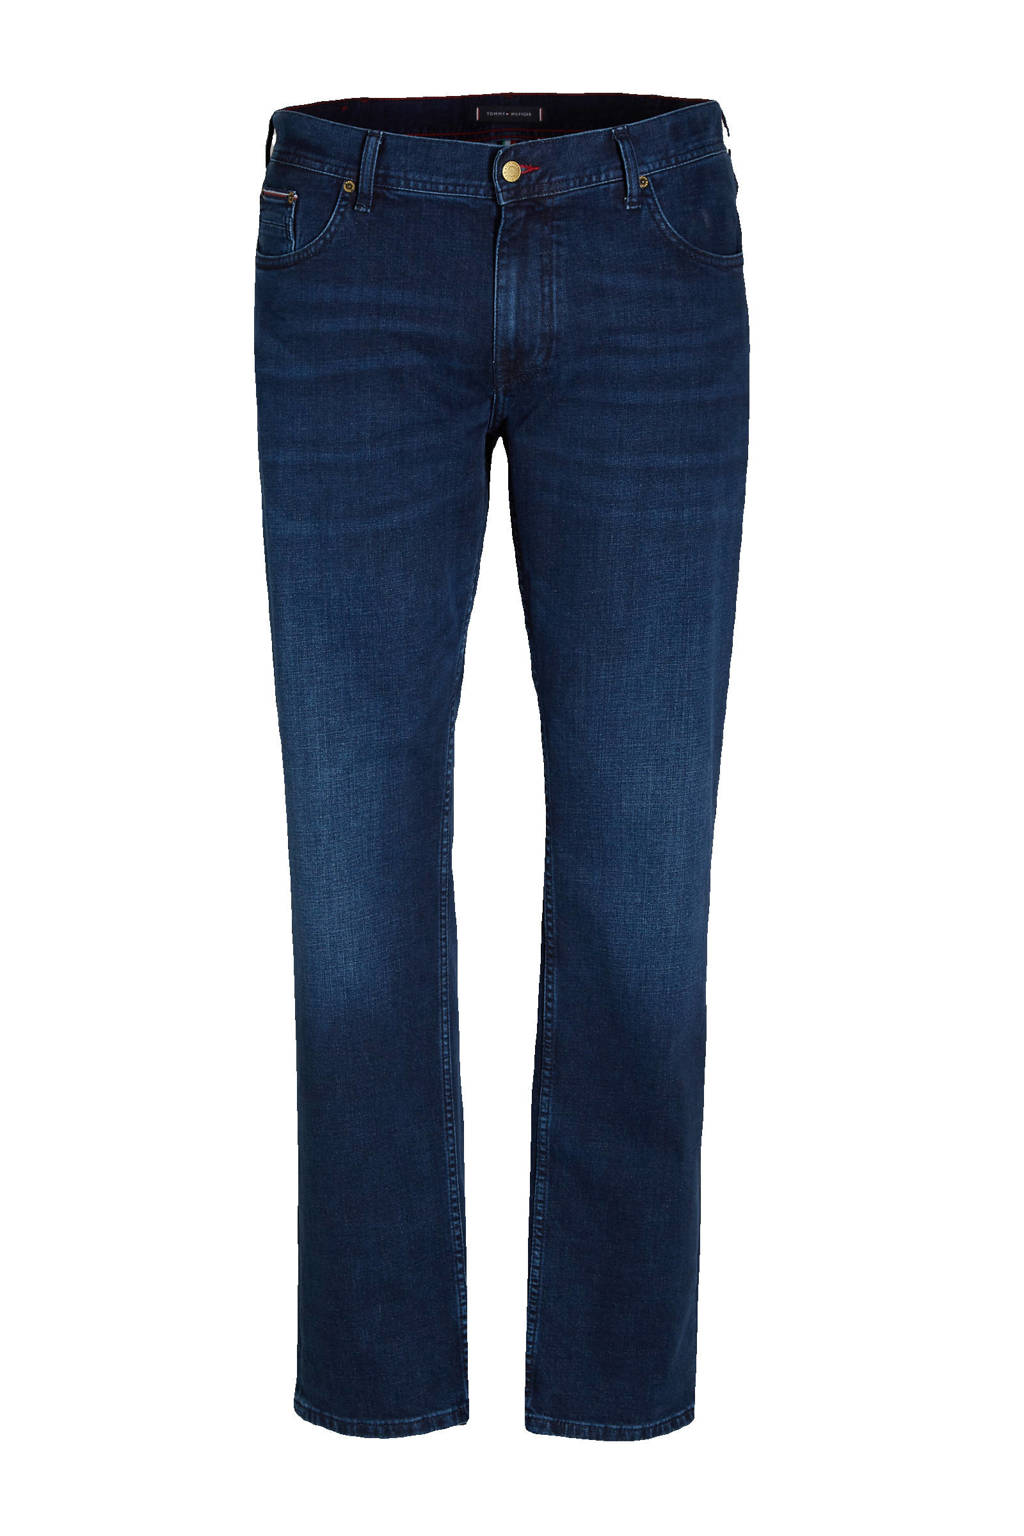 Tommy Hilfiger Big & Tall straight fit jeans Plus Size bridger indigo, Bridger Indigo